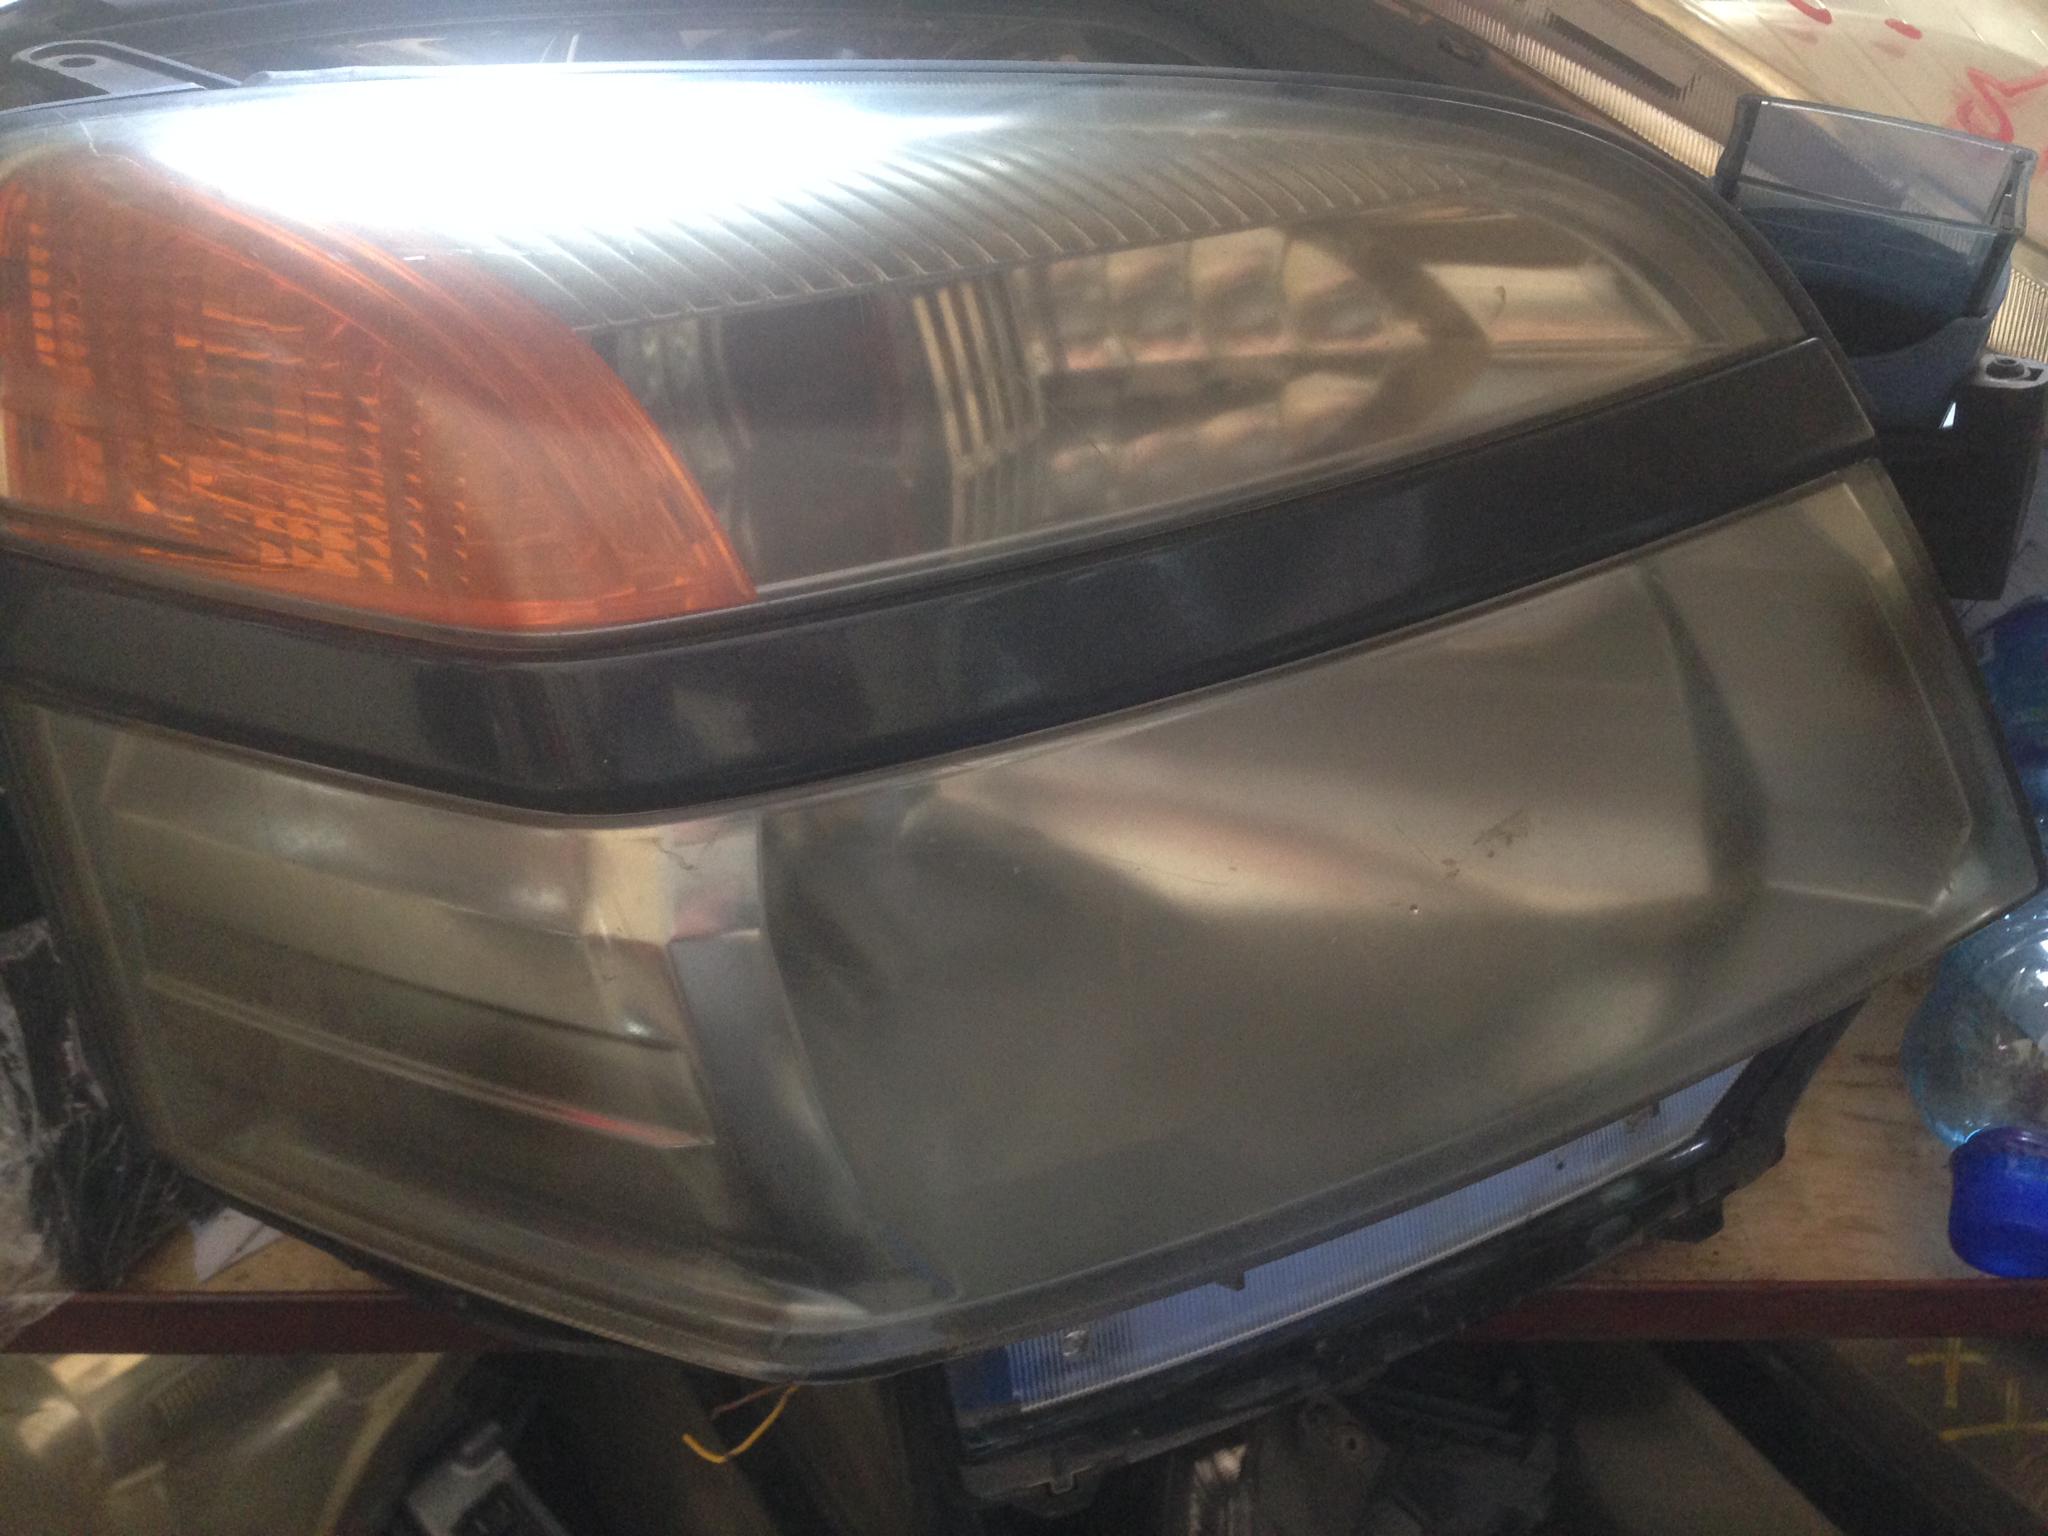 Toyota AZR60 voxy tail light 01001